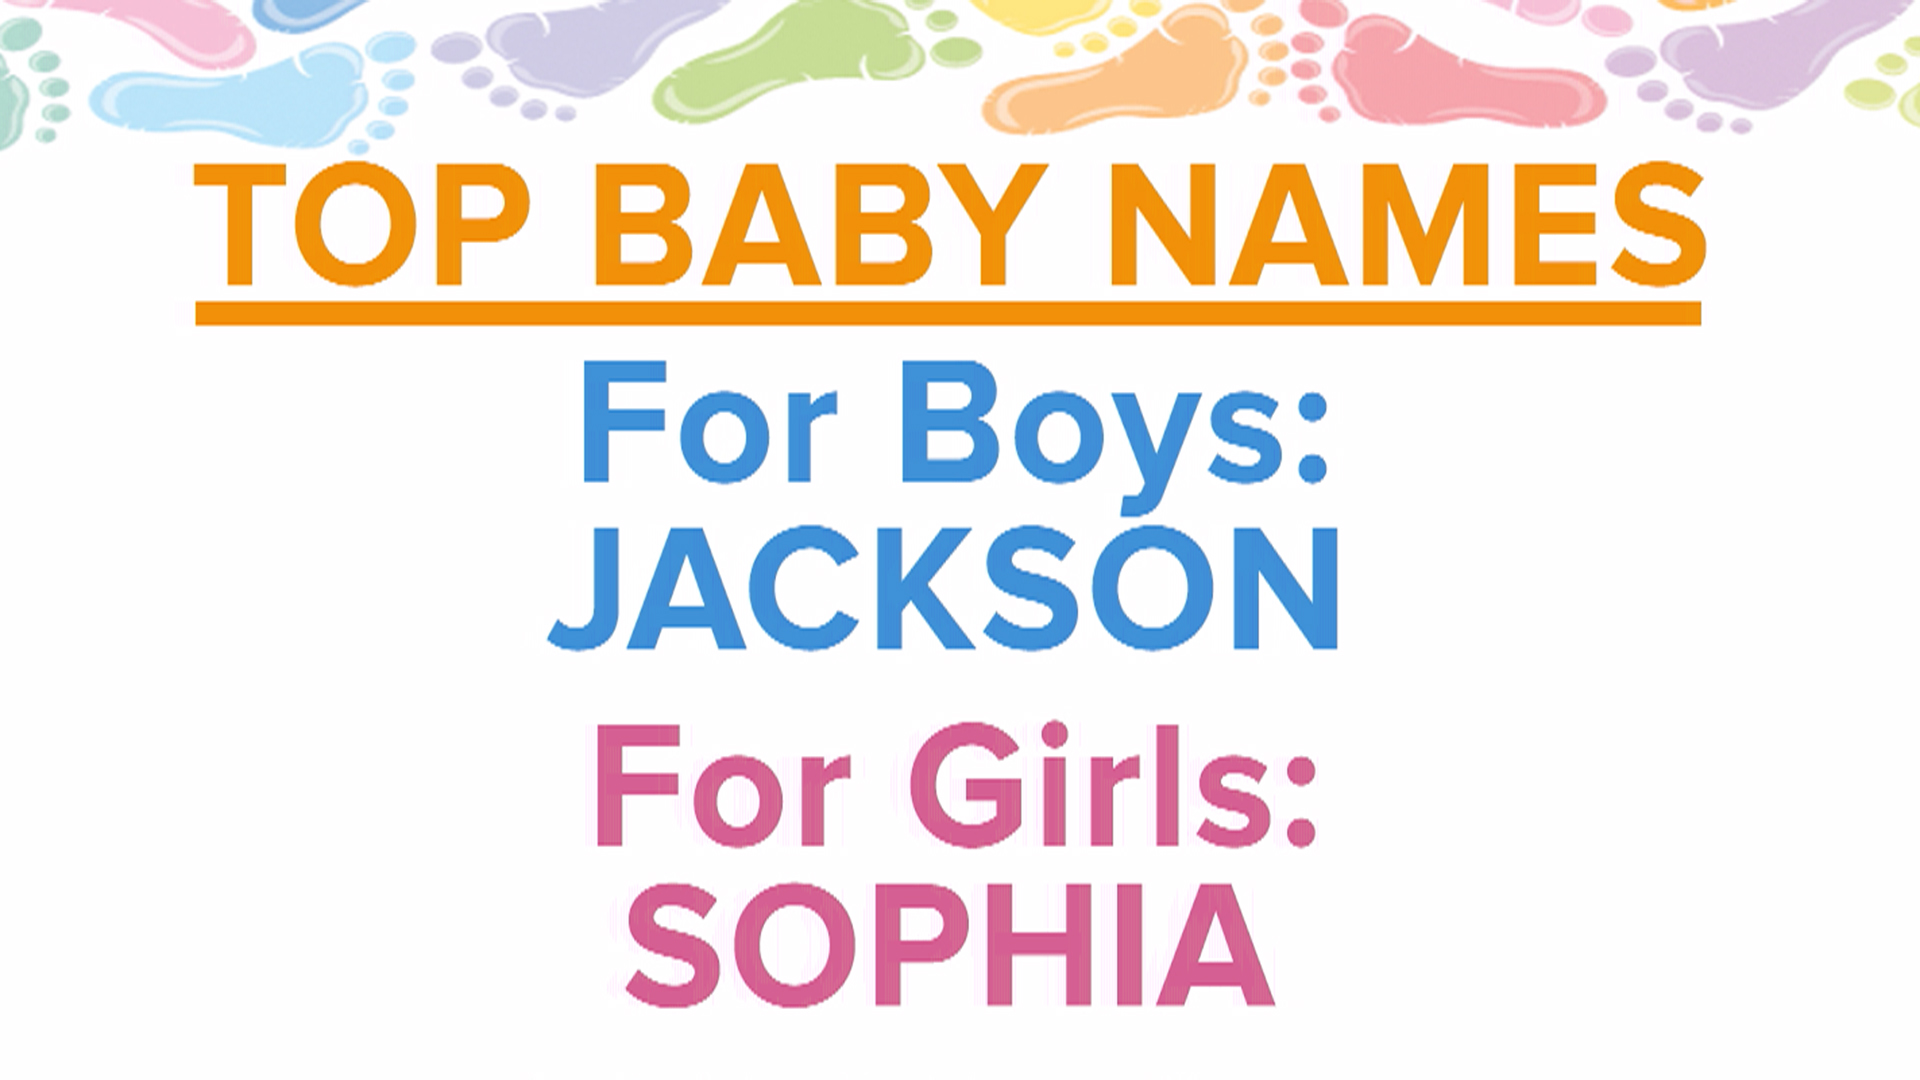 9 things I wish I knew before I chose my baby's name